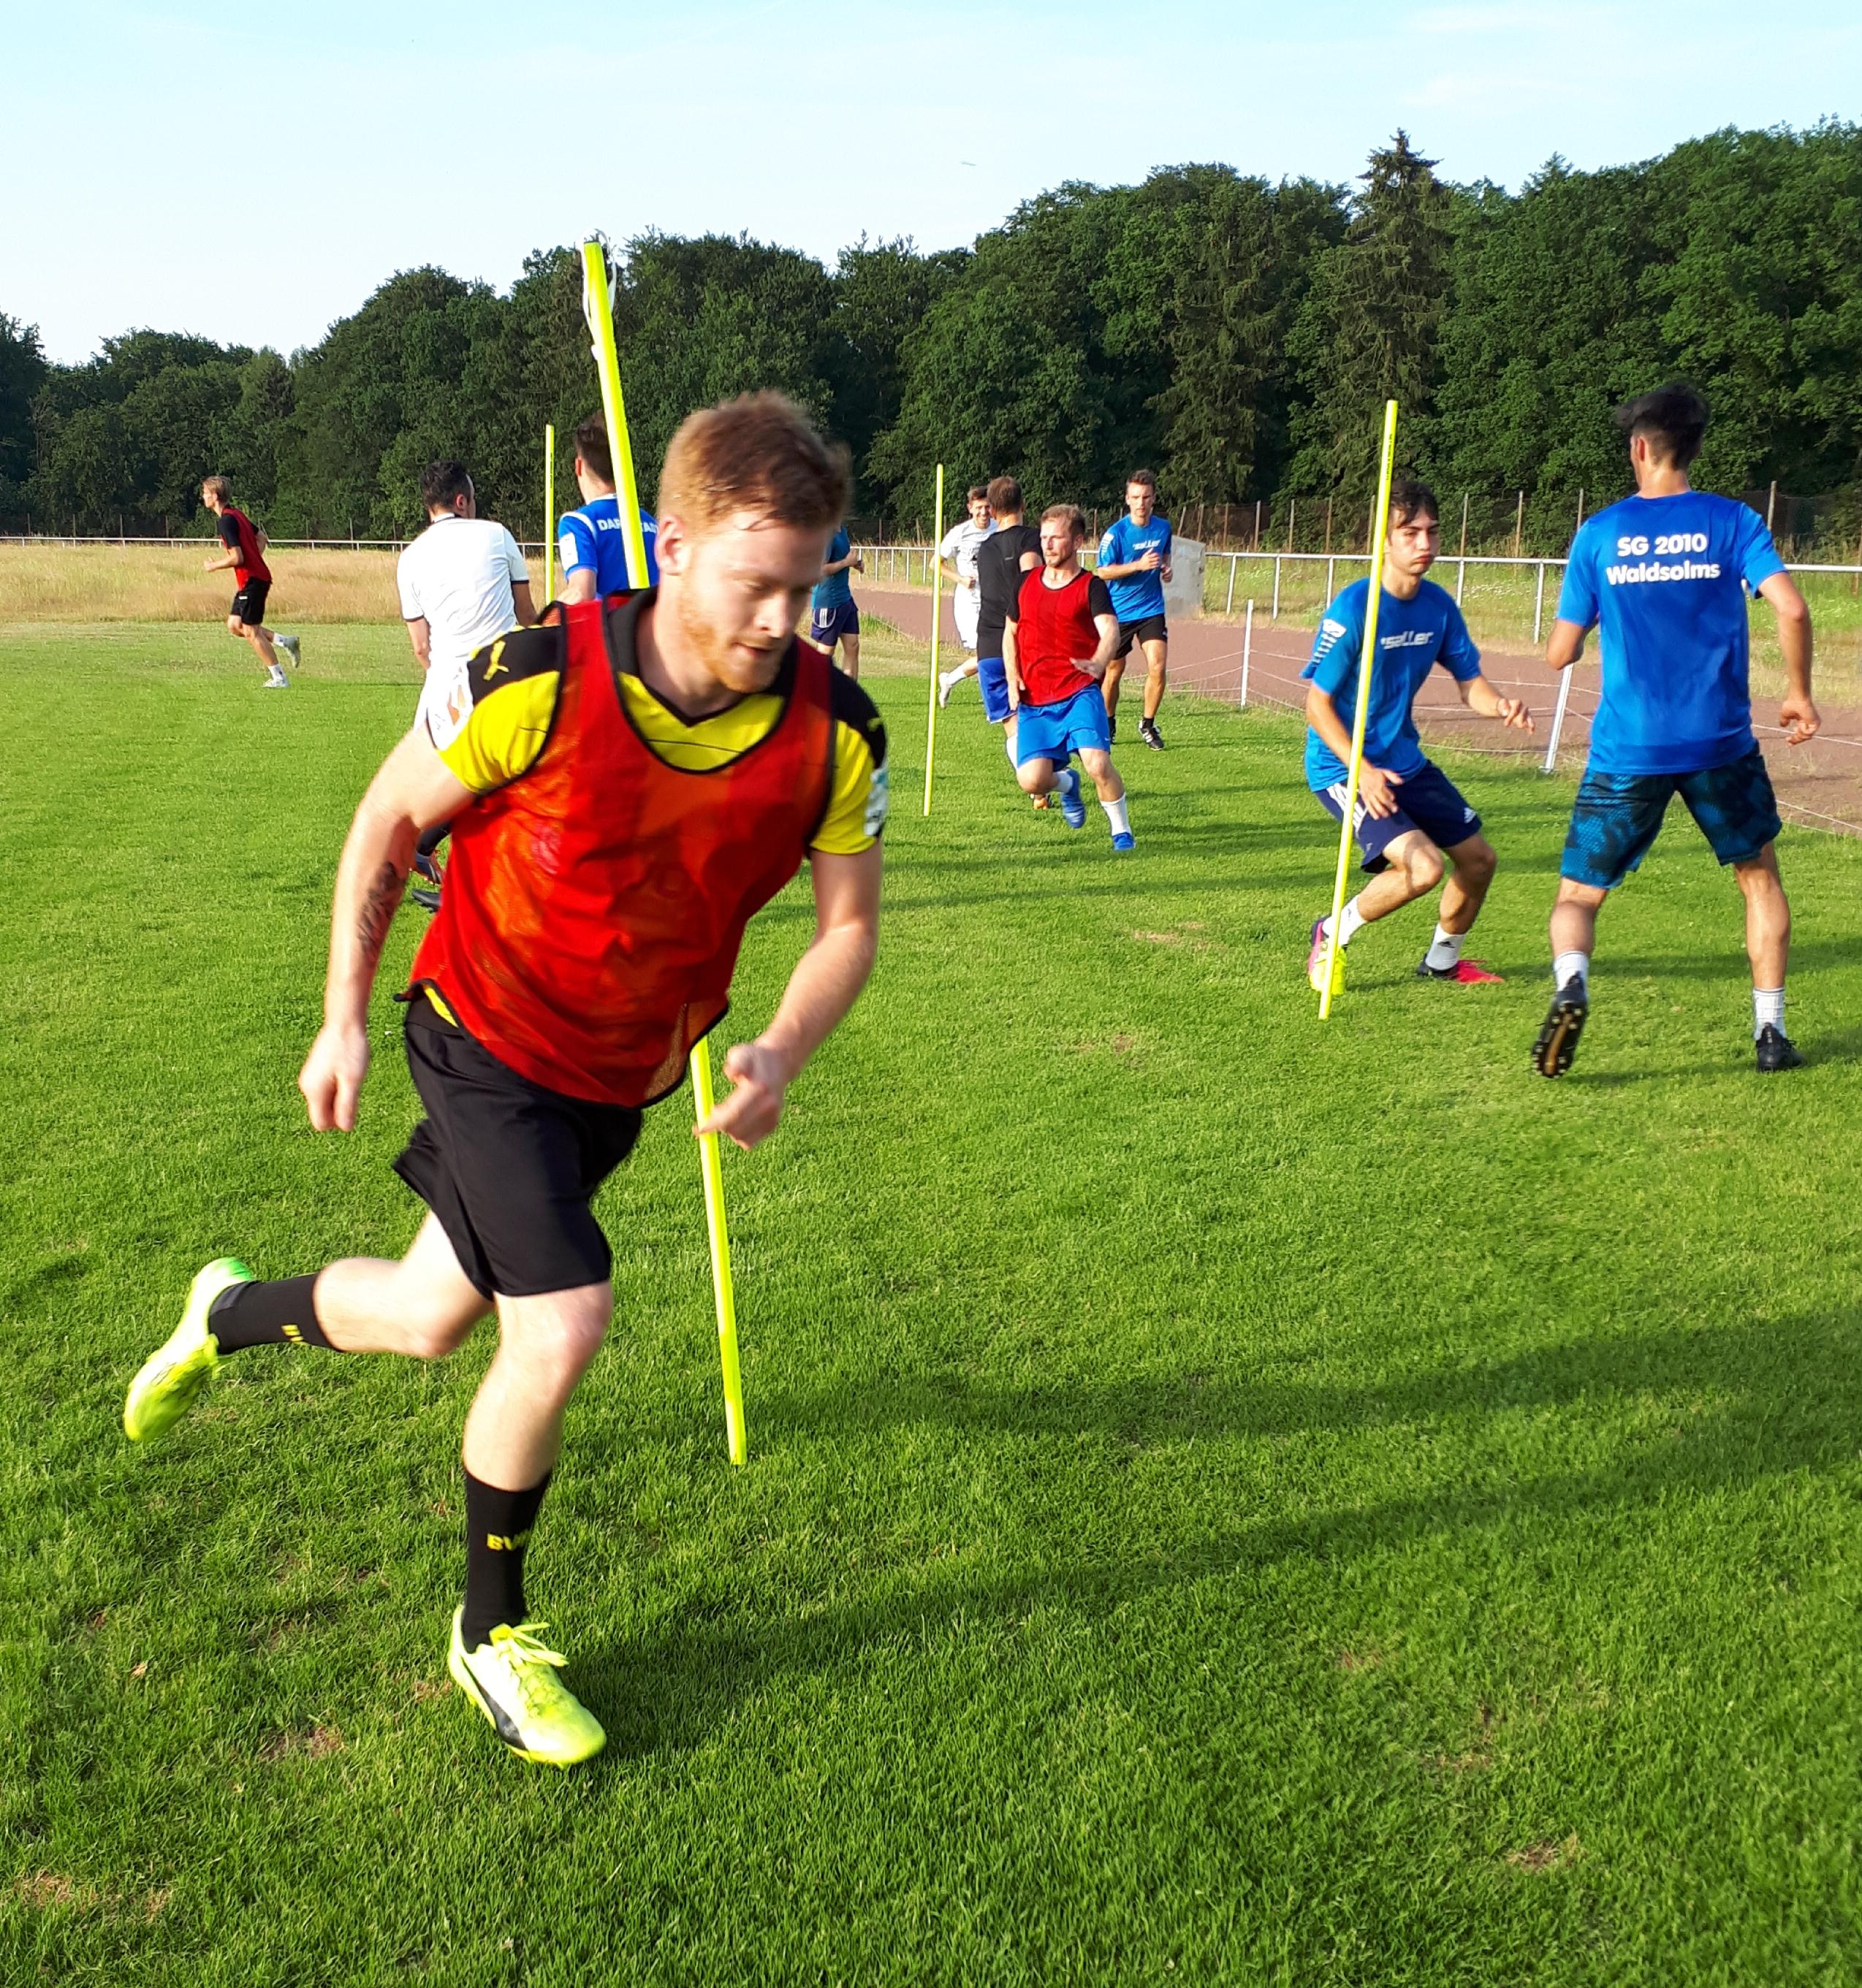 RSV startet mit Neuzugang Lennart Faber in Saisonvorbereitung